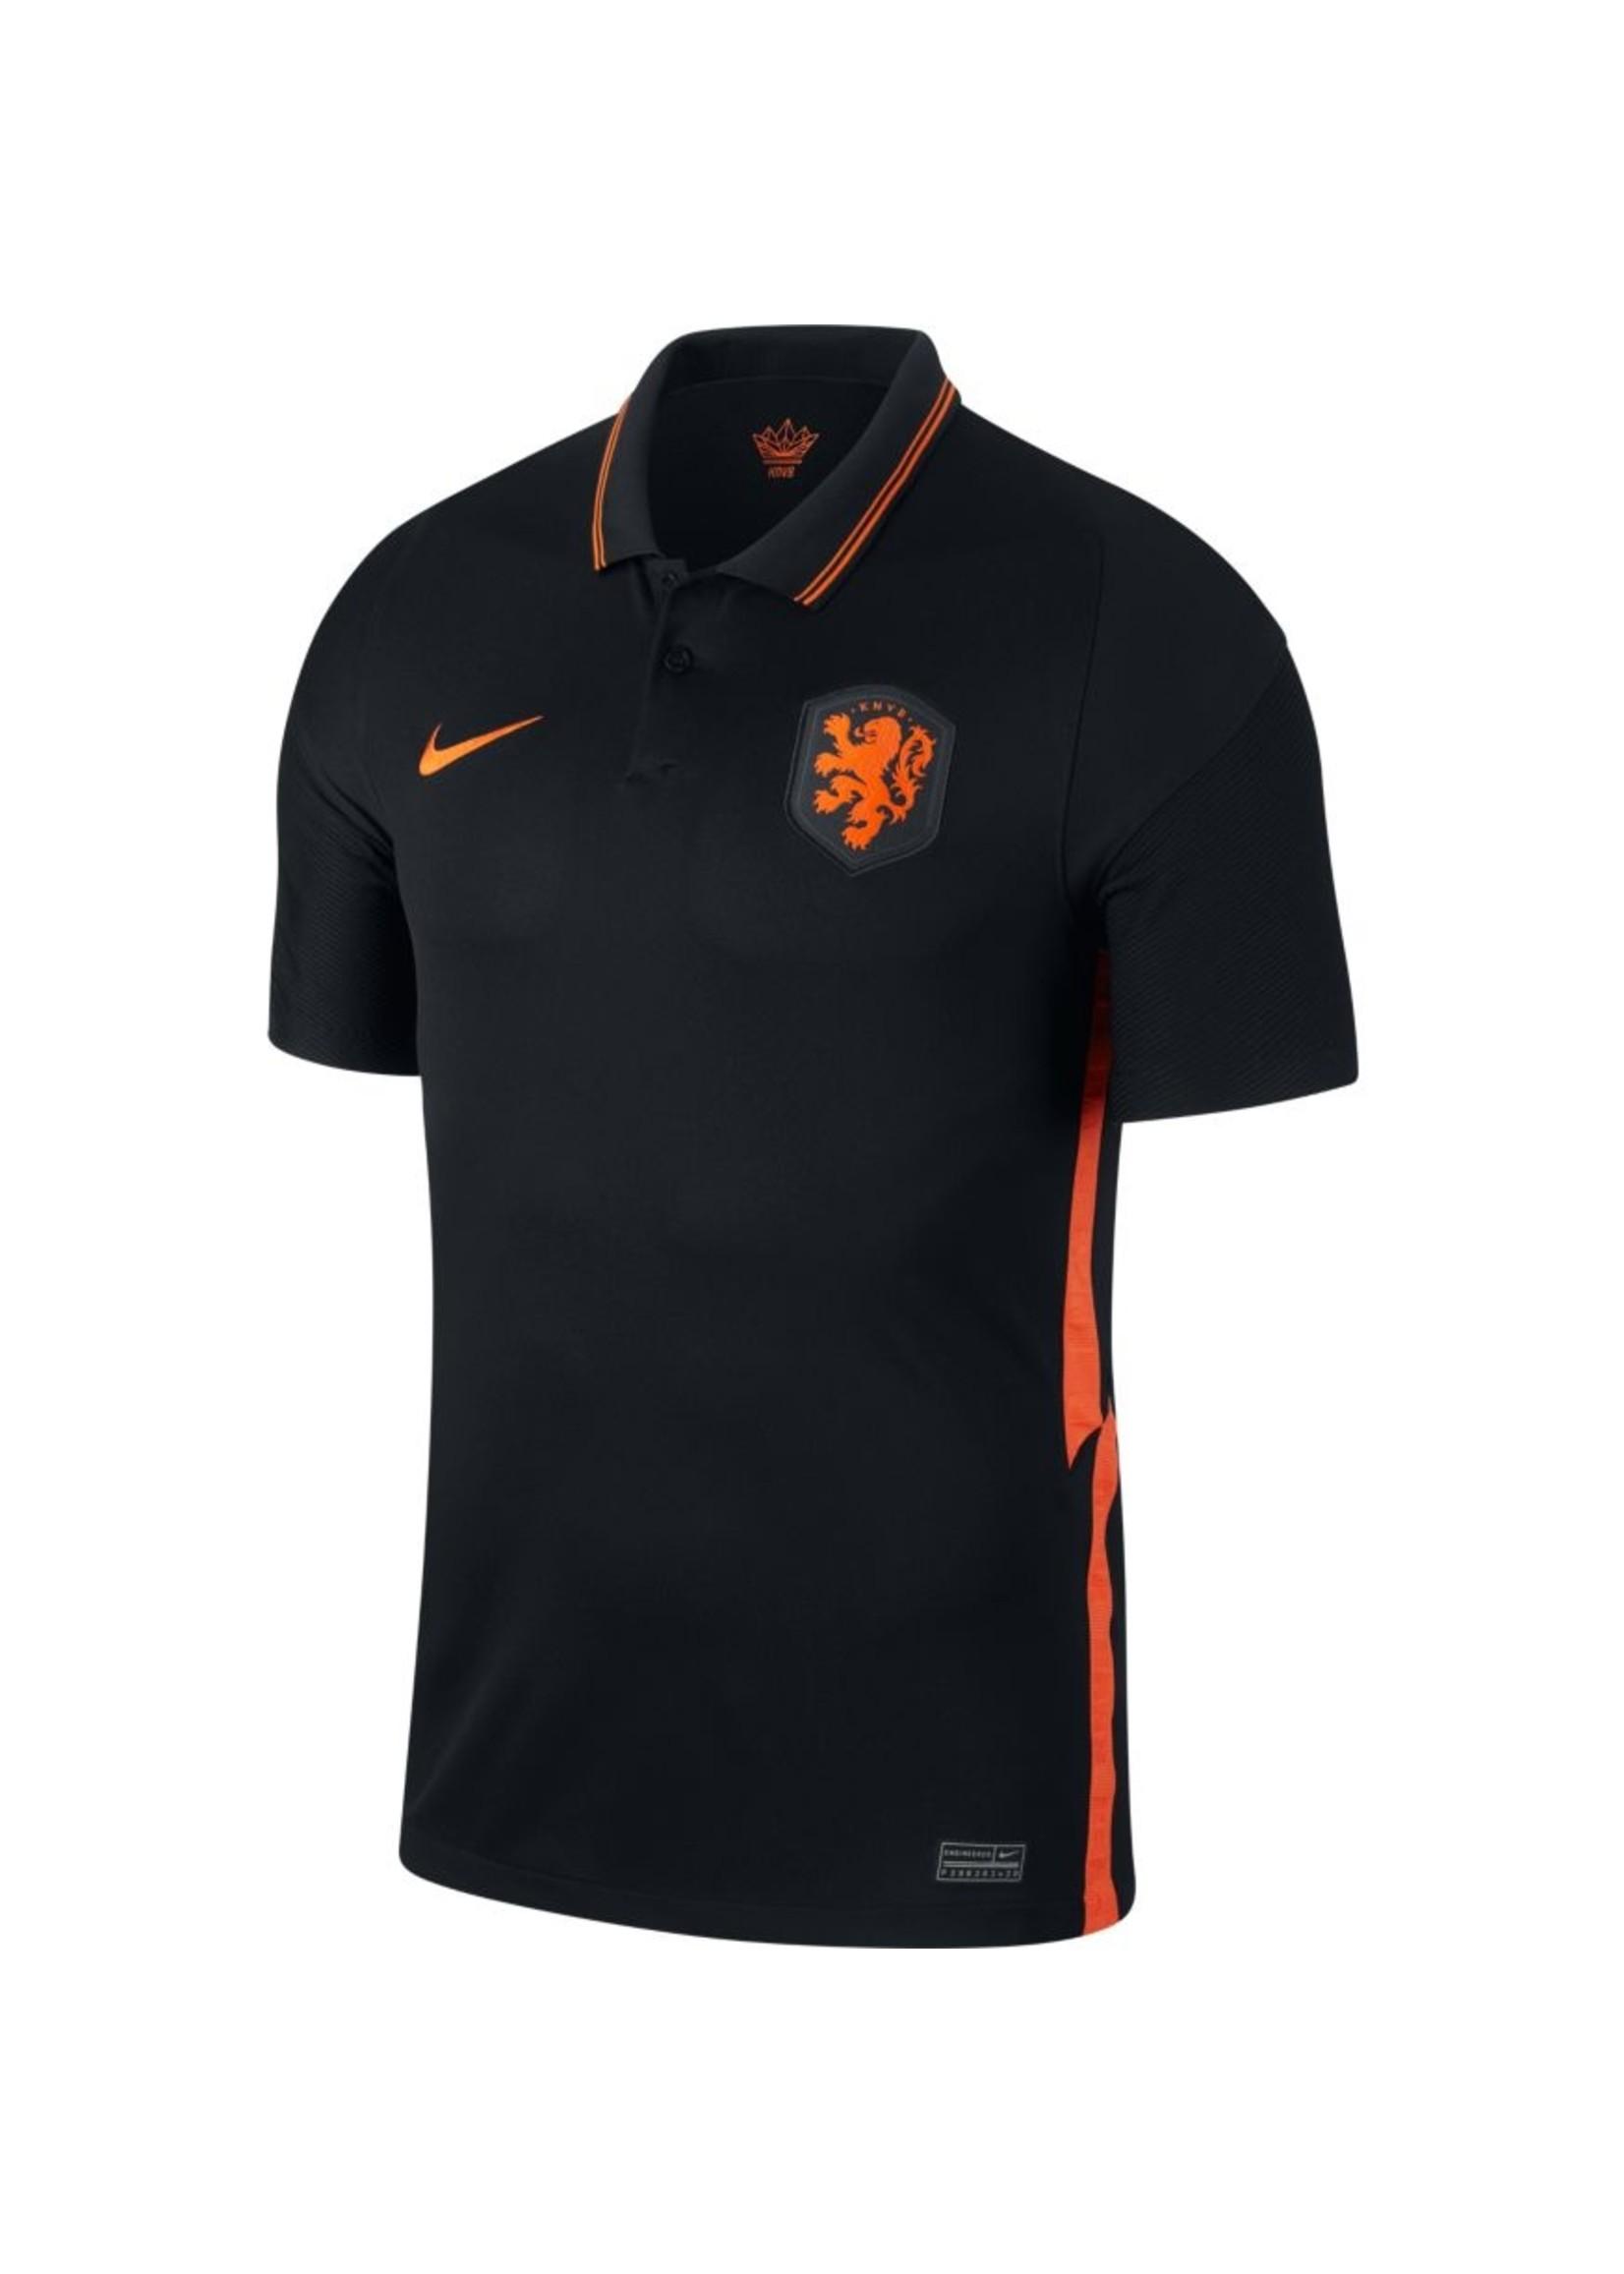 Nike Netherlands 20/21 Away Jersey Adult